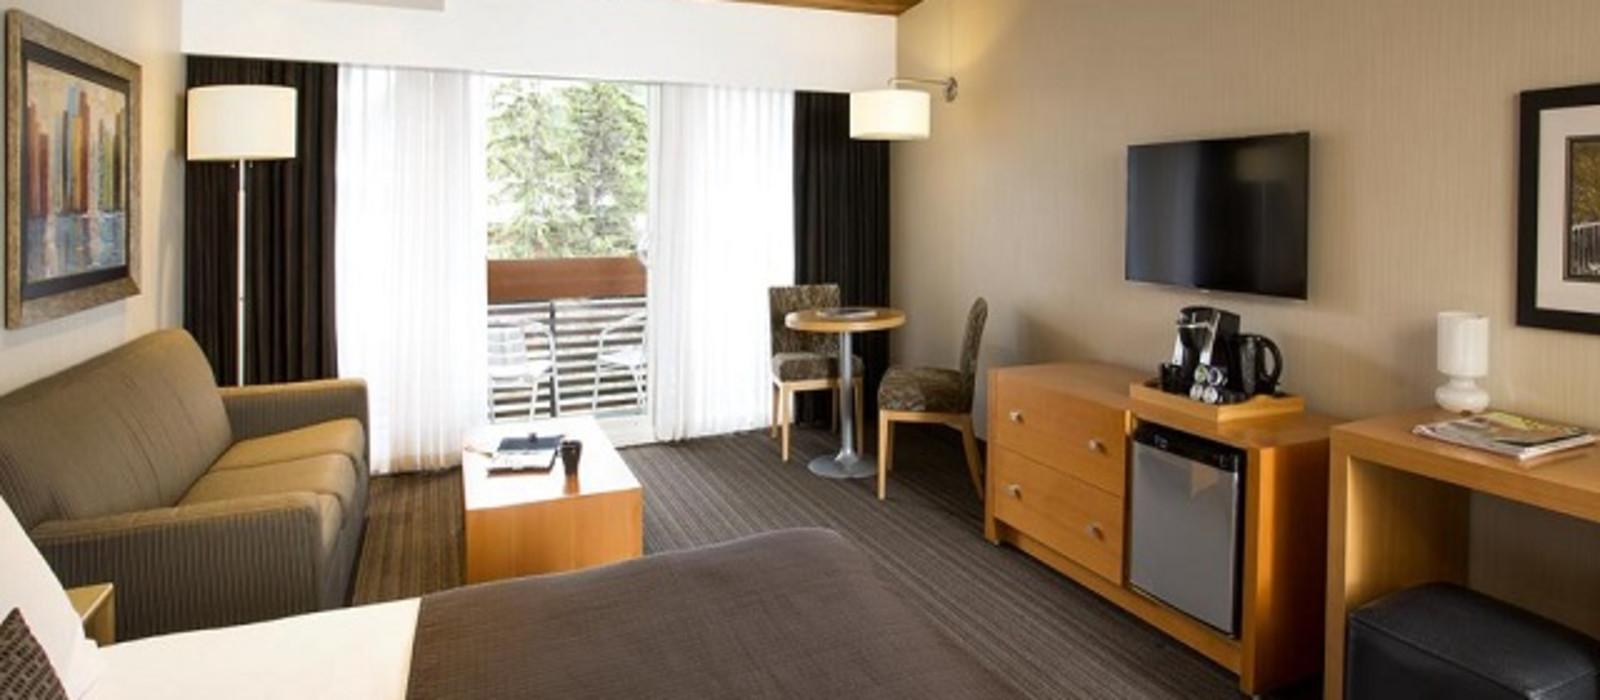 Hotel Banff Aspen Lodge Kanada